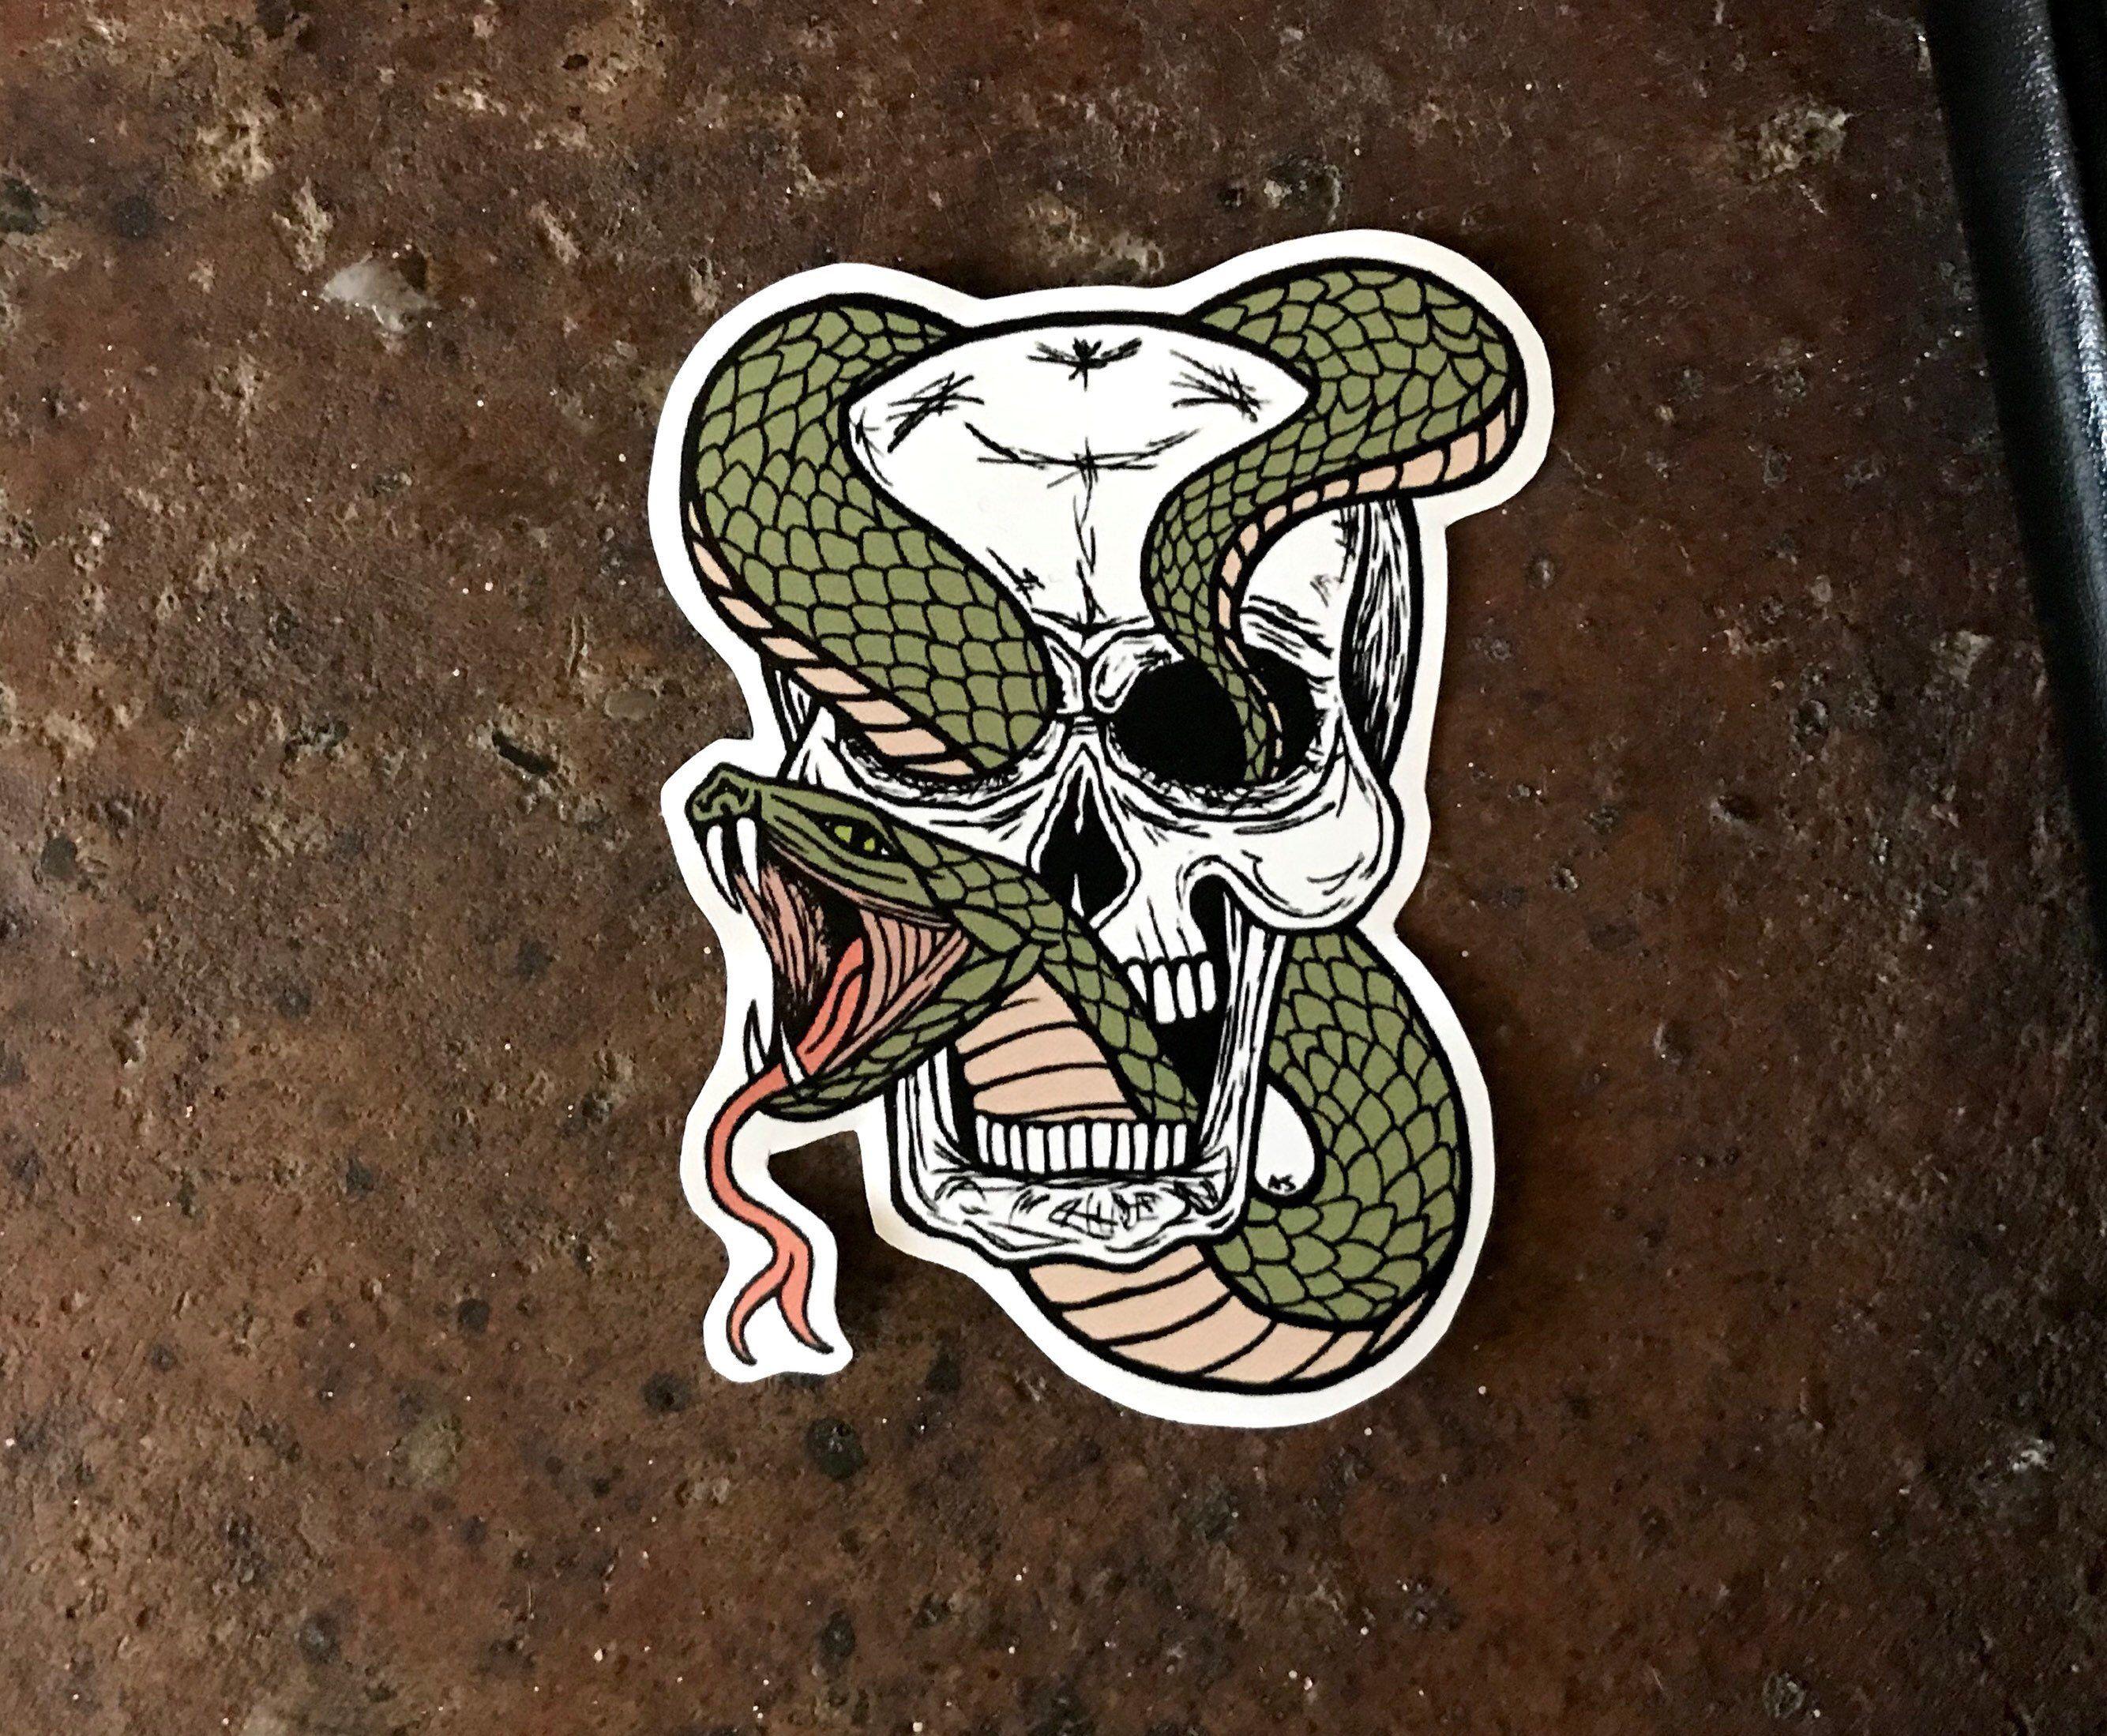 Vinyl Sticker Snake Skull Sticker Skull Sticker Tattoo Etsy Skull Sticker Vinyl Sticker Paper Tattoo Stickers [ jpg ]